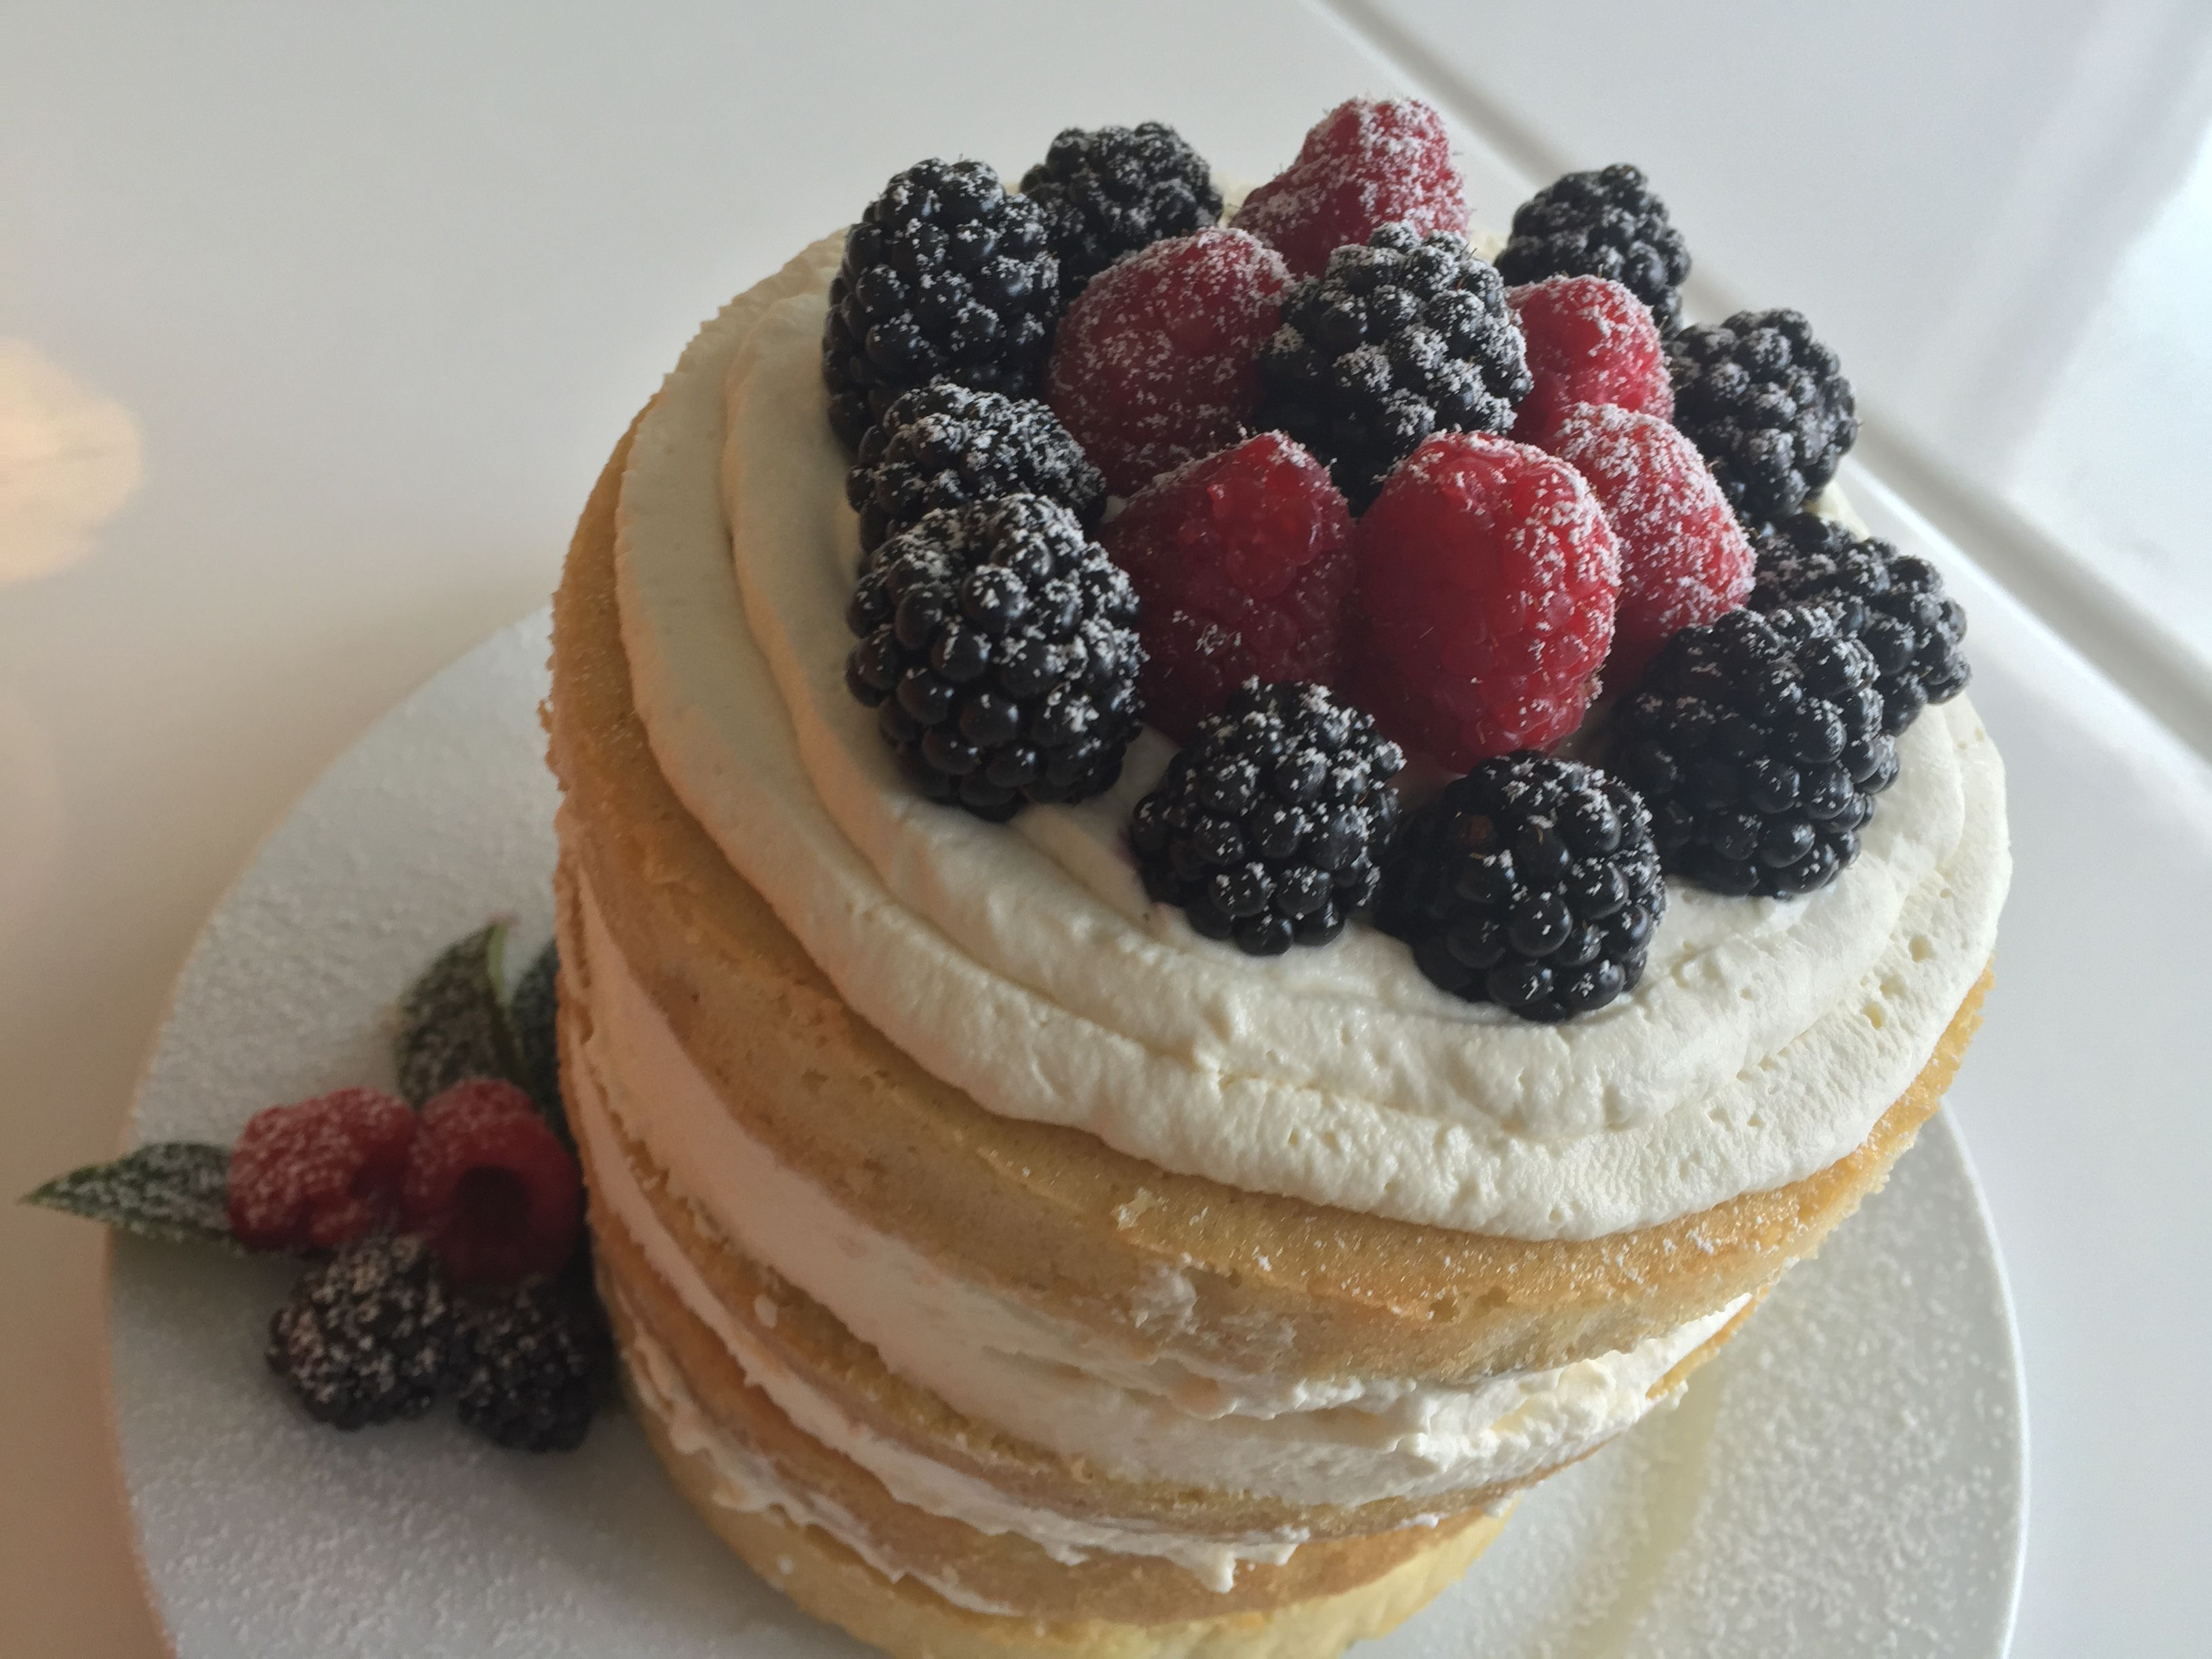 Naked Vanilla Cake with Mascarpone and Berries Fioa